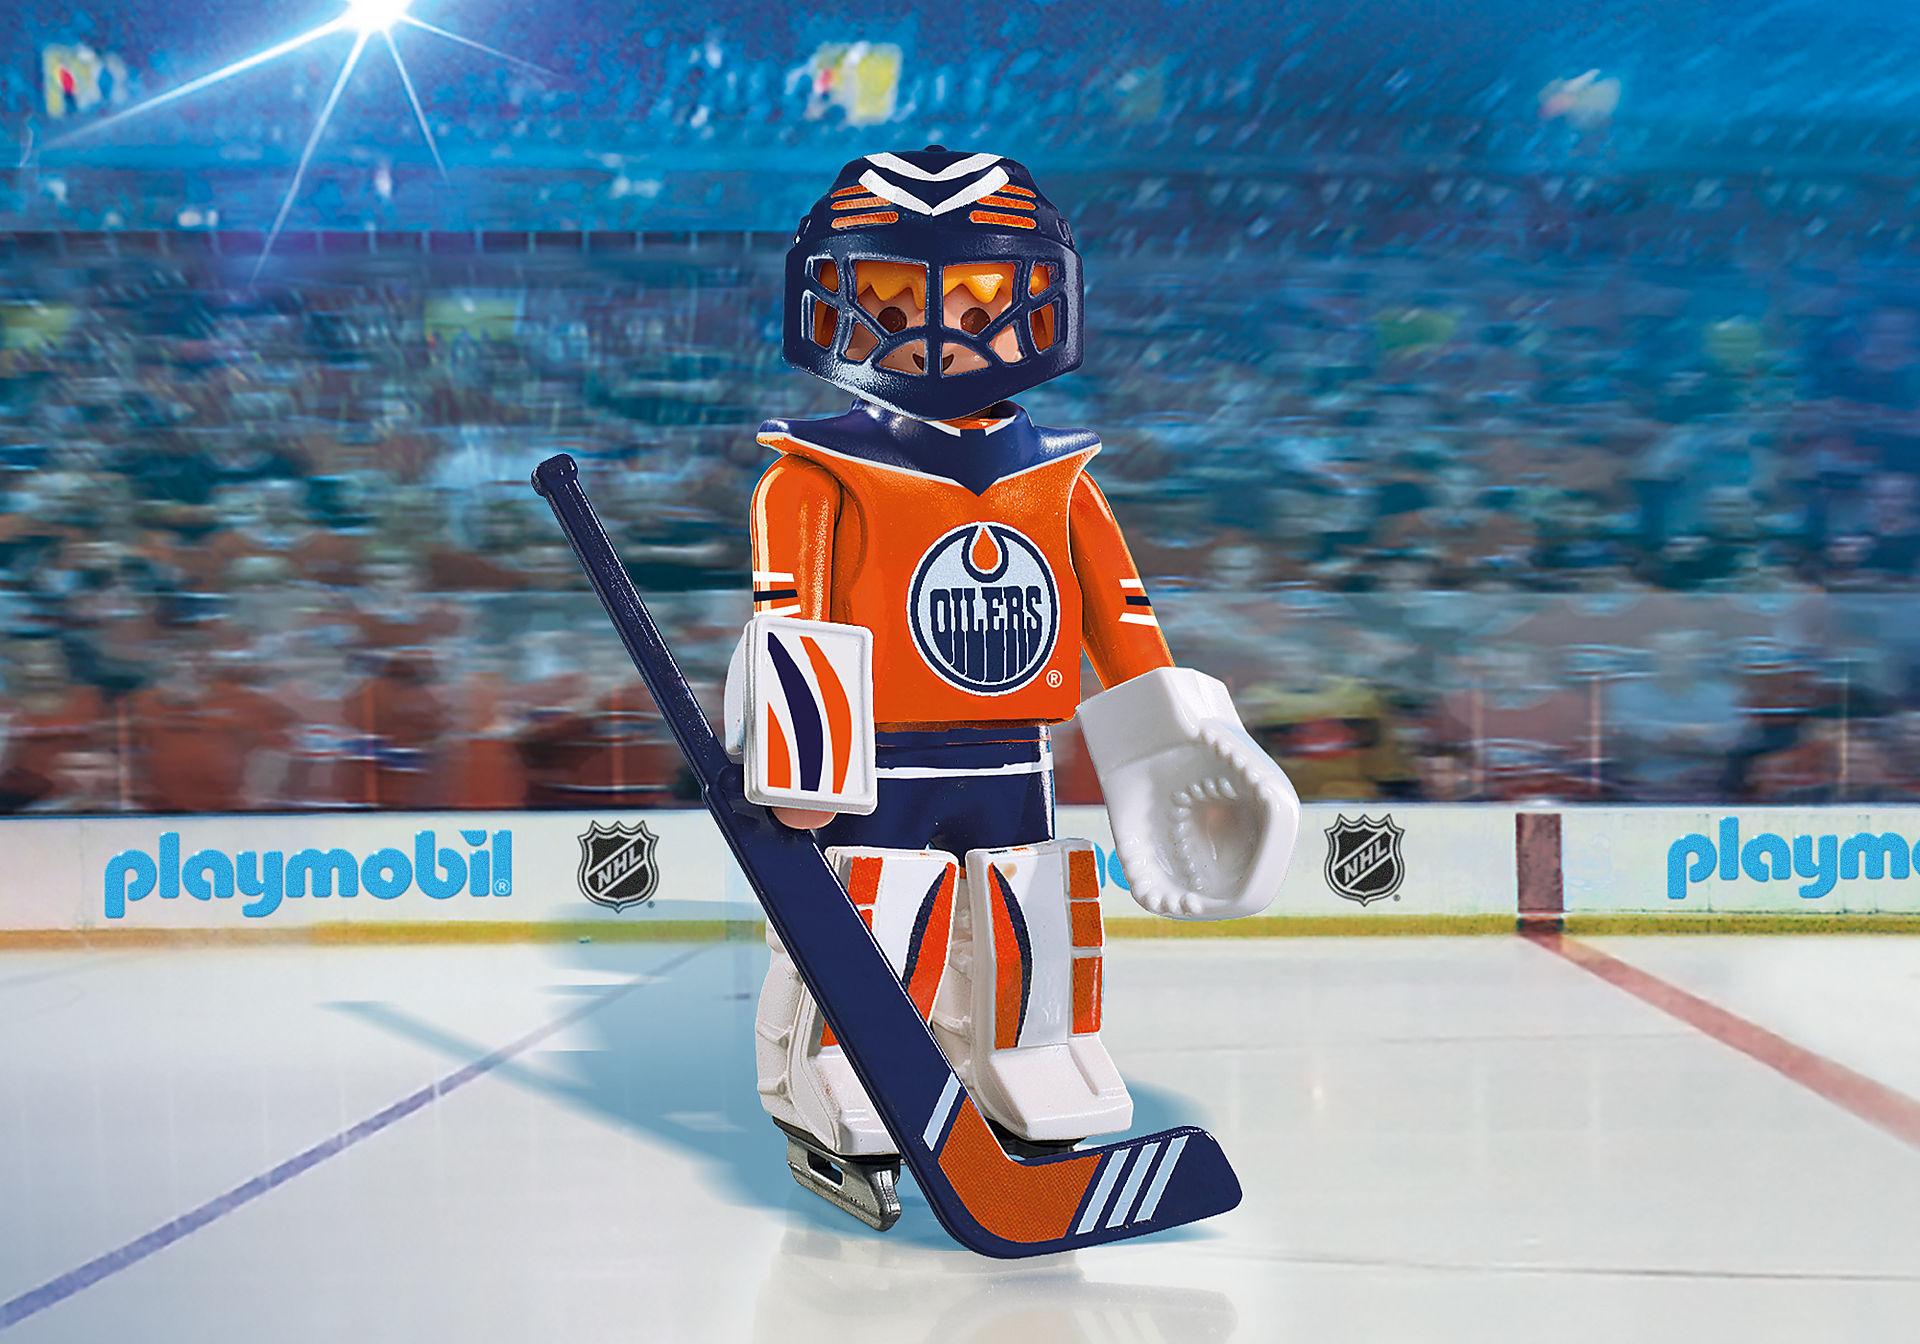 9022 NHL Portero Edmonton Oilers zoom image1